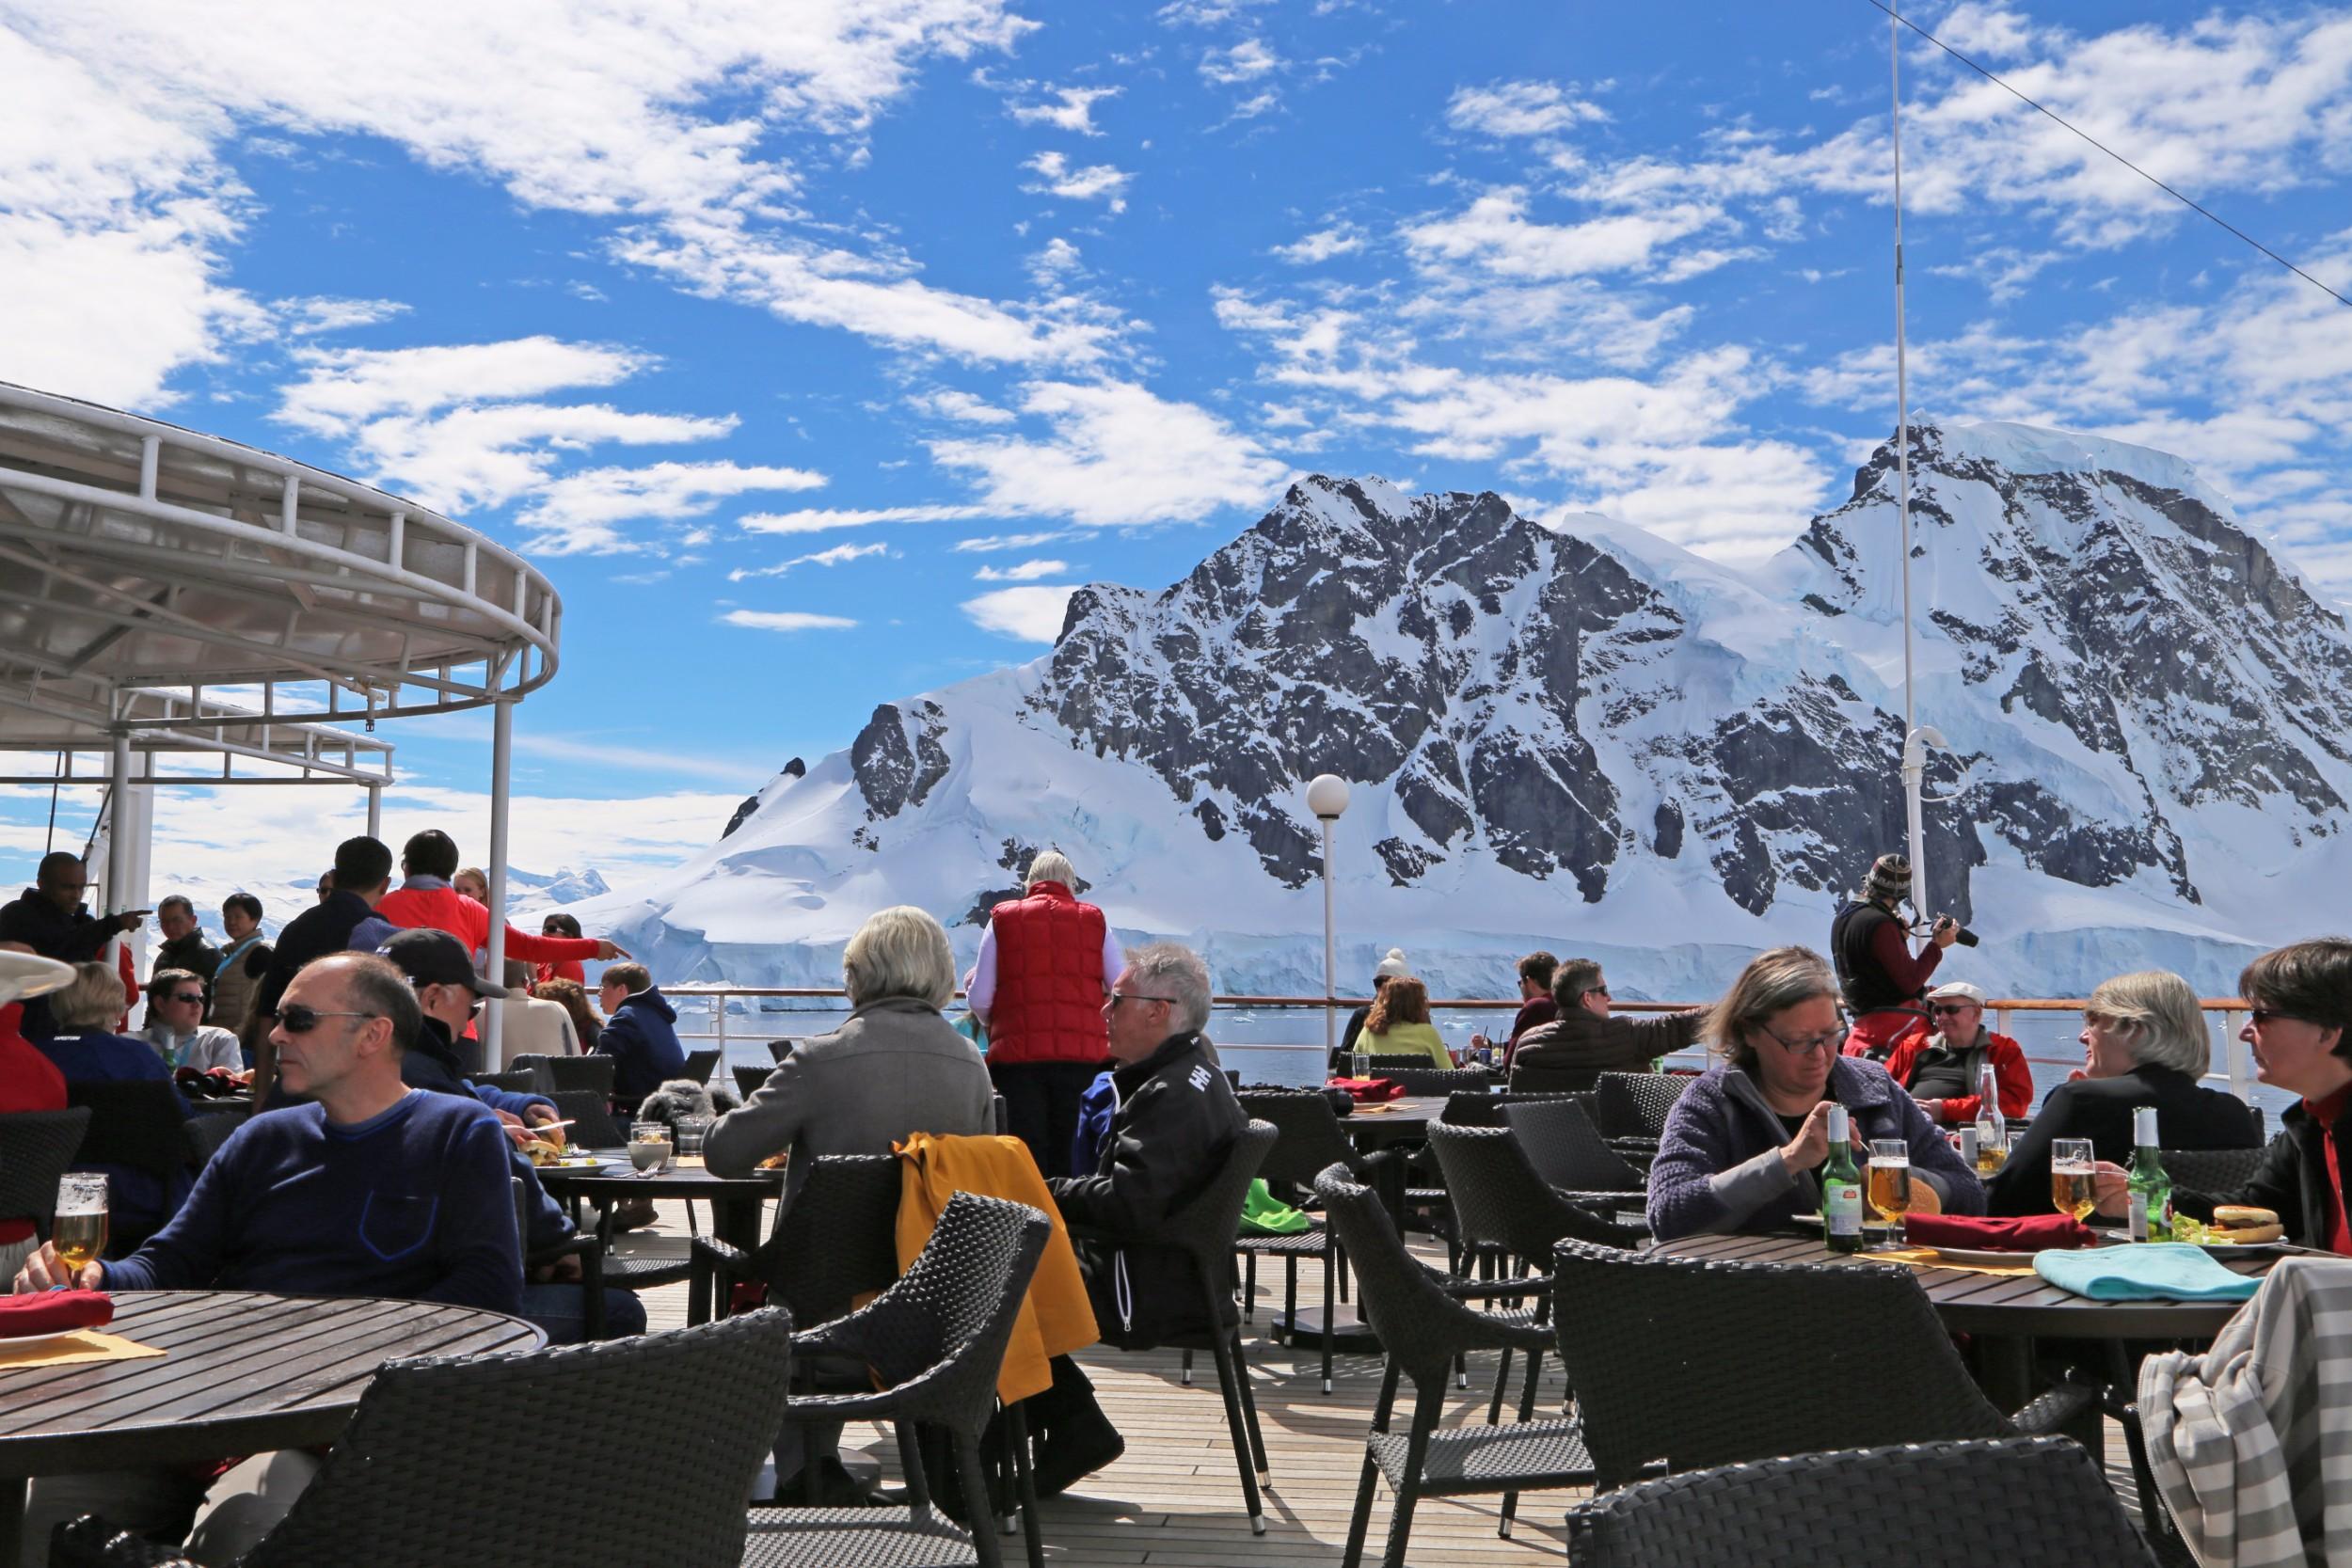 Polar Latitudes_SeaExplorer_Dining_On_Deck_Original_14236.jpg